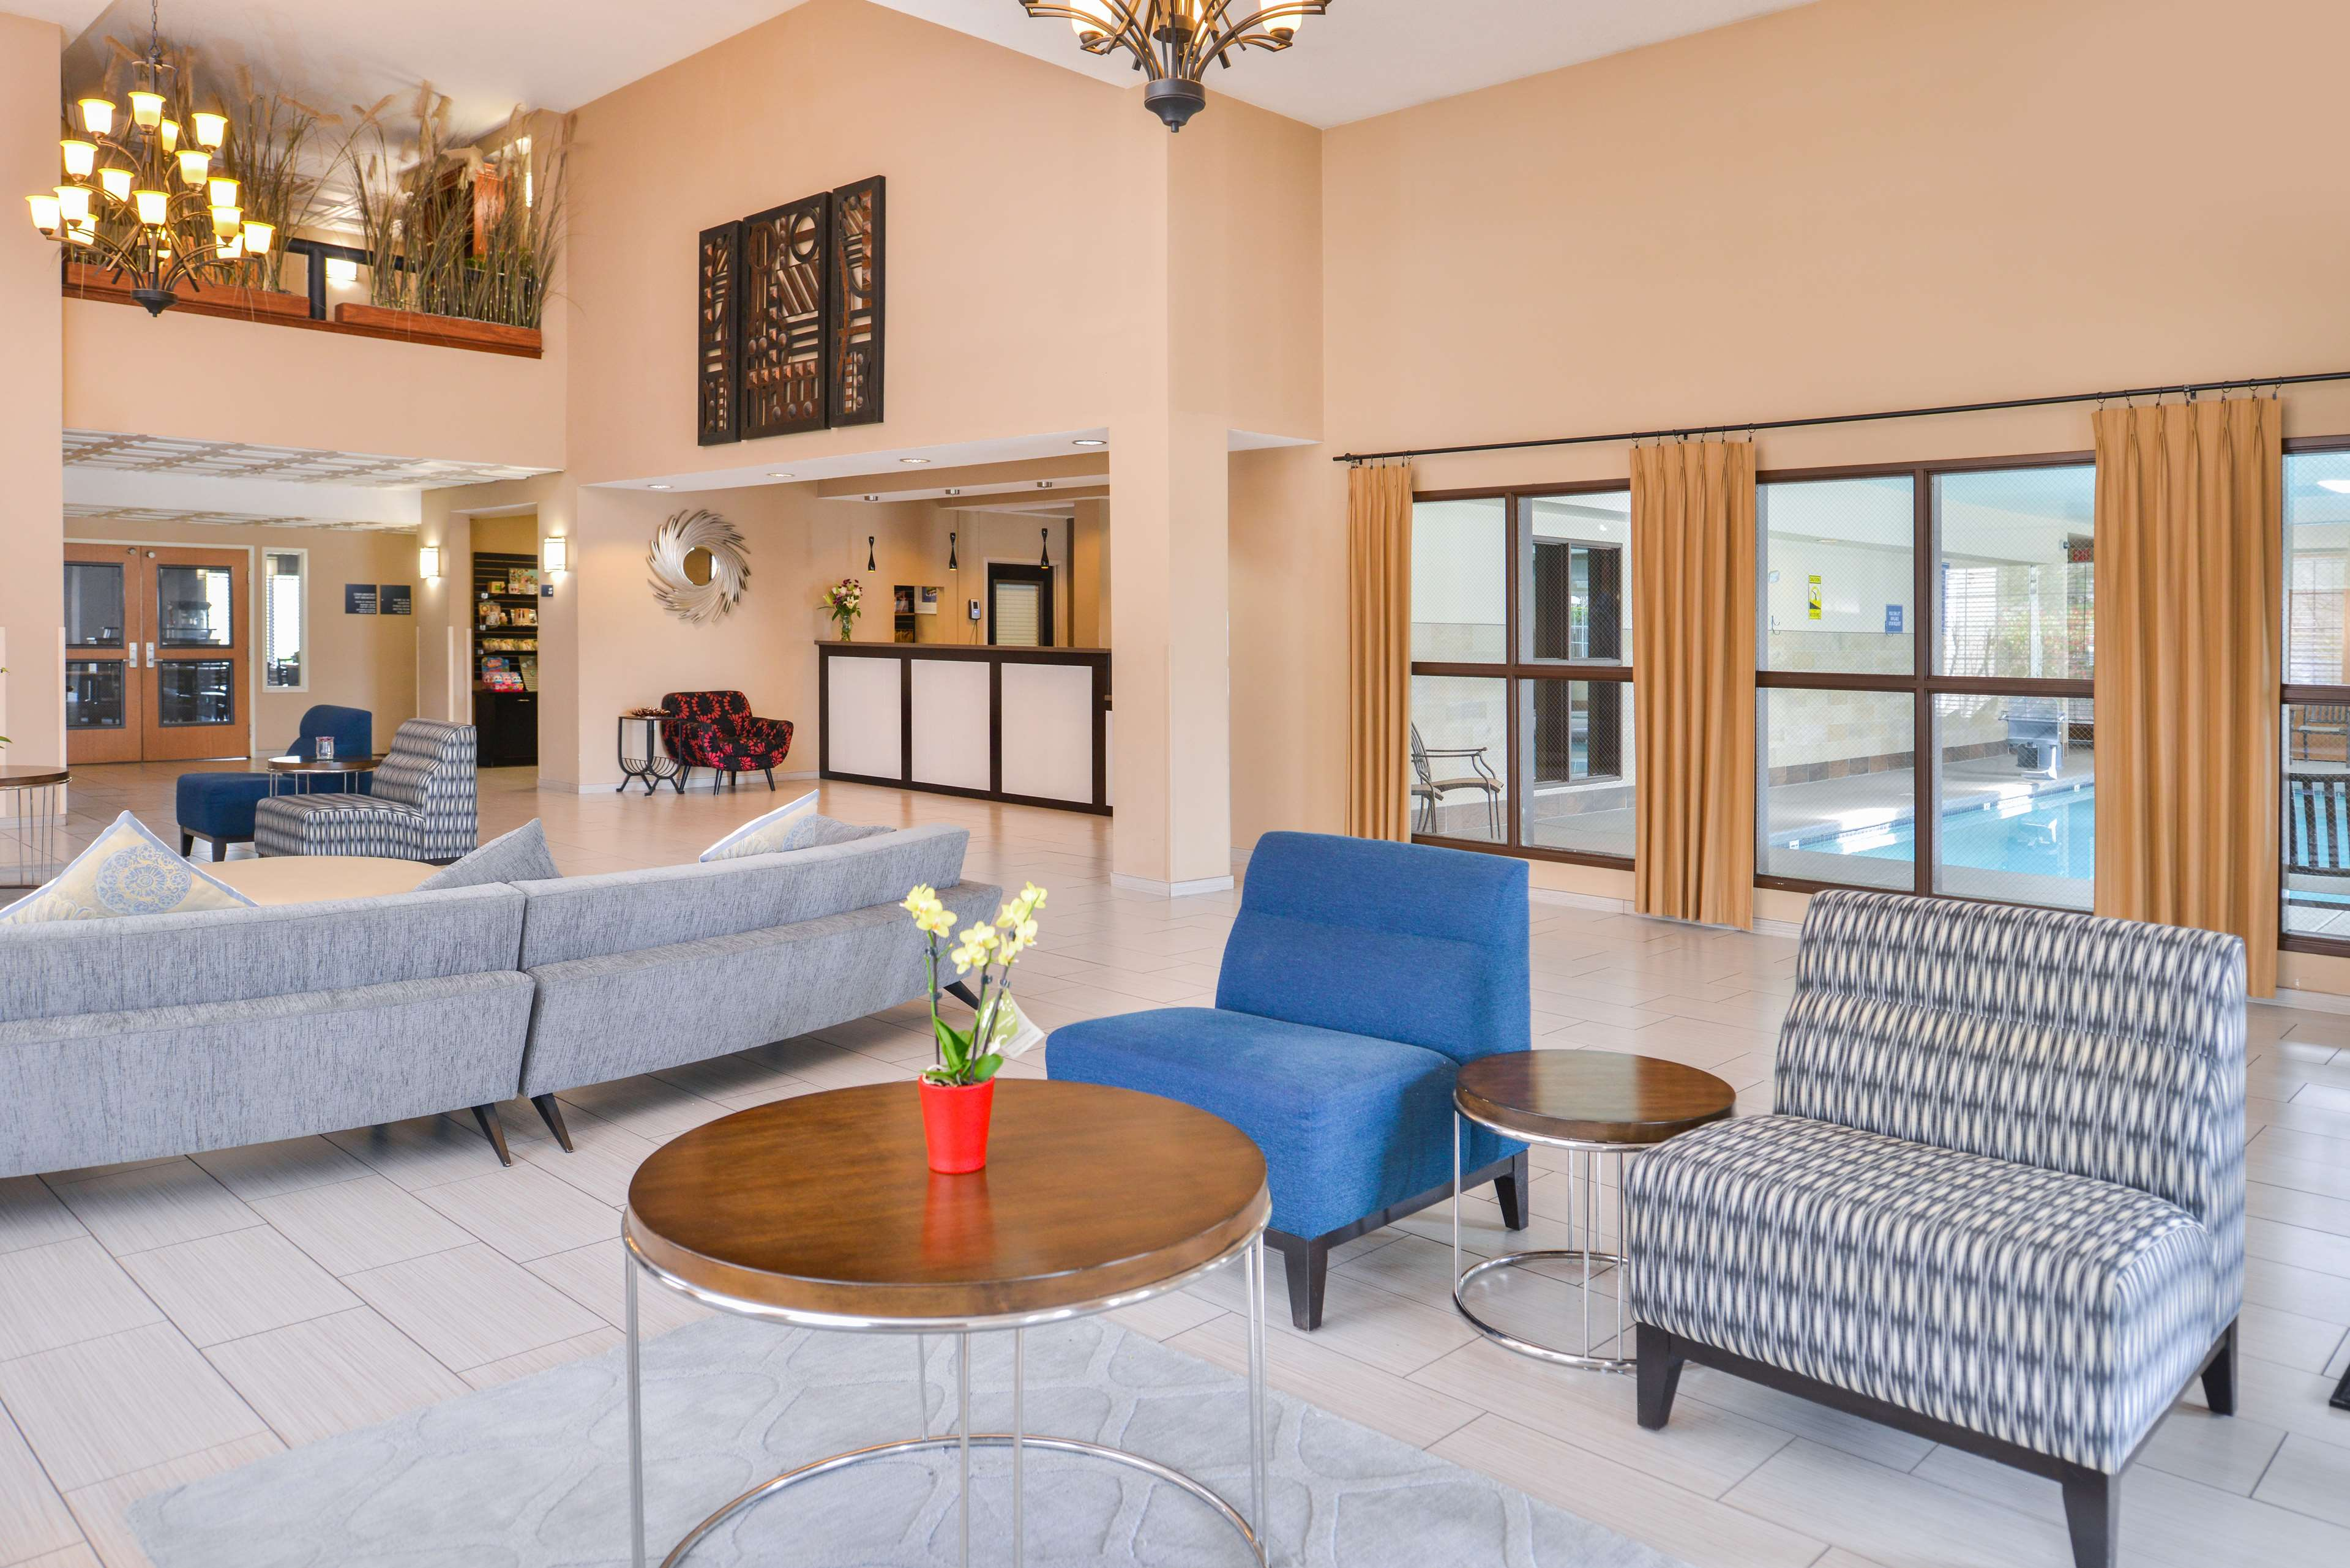 Best Western Plus Mountain View Auburn Inn image 6